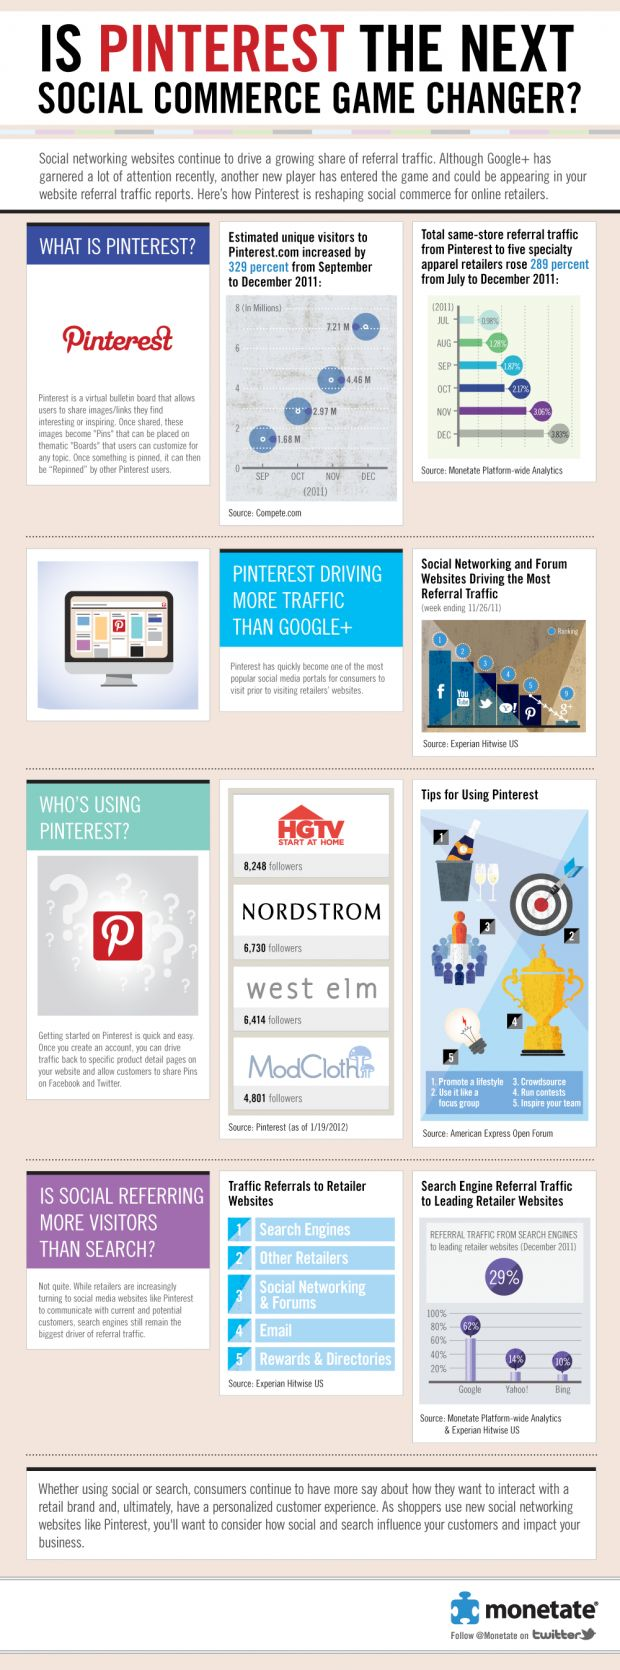 Should Marketers be Pinterested?Social Network, Social Commerce, Internet Marketing, Website, Social Media, The Games, Infographic, Socialmedia, Games Changer